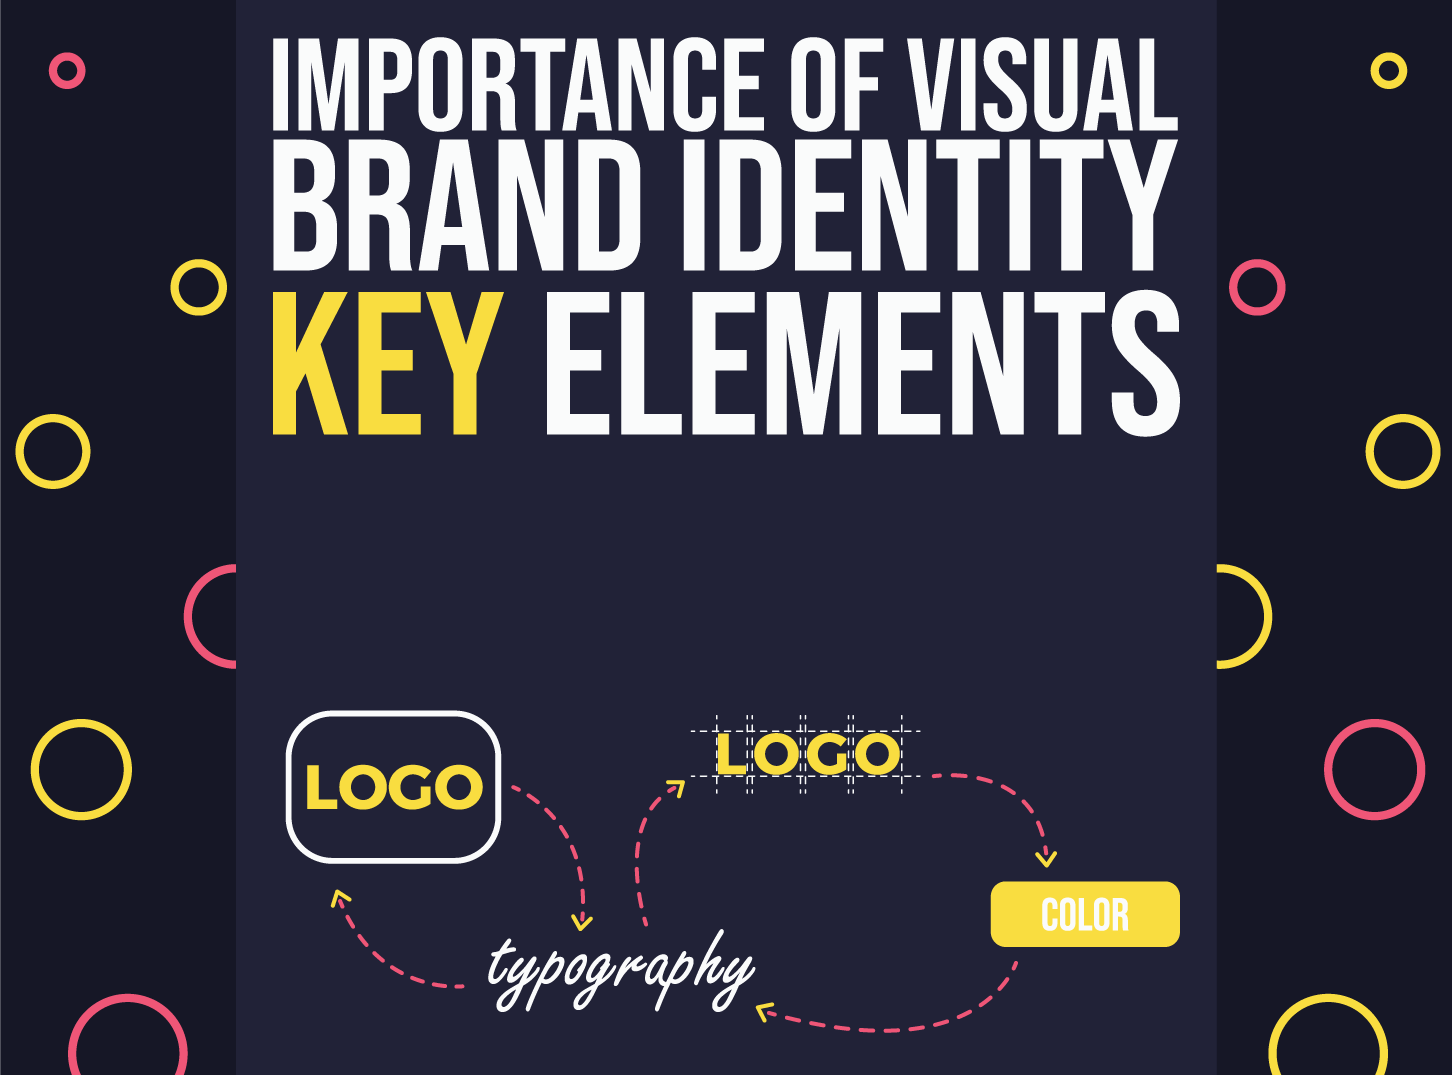 Visual Brand Identity & Key Elements for it - Inkyy Web Design Studio